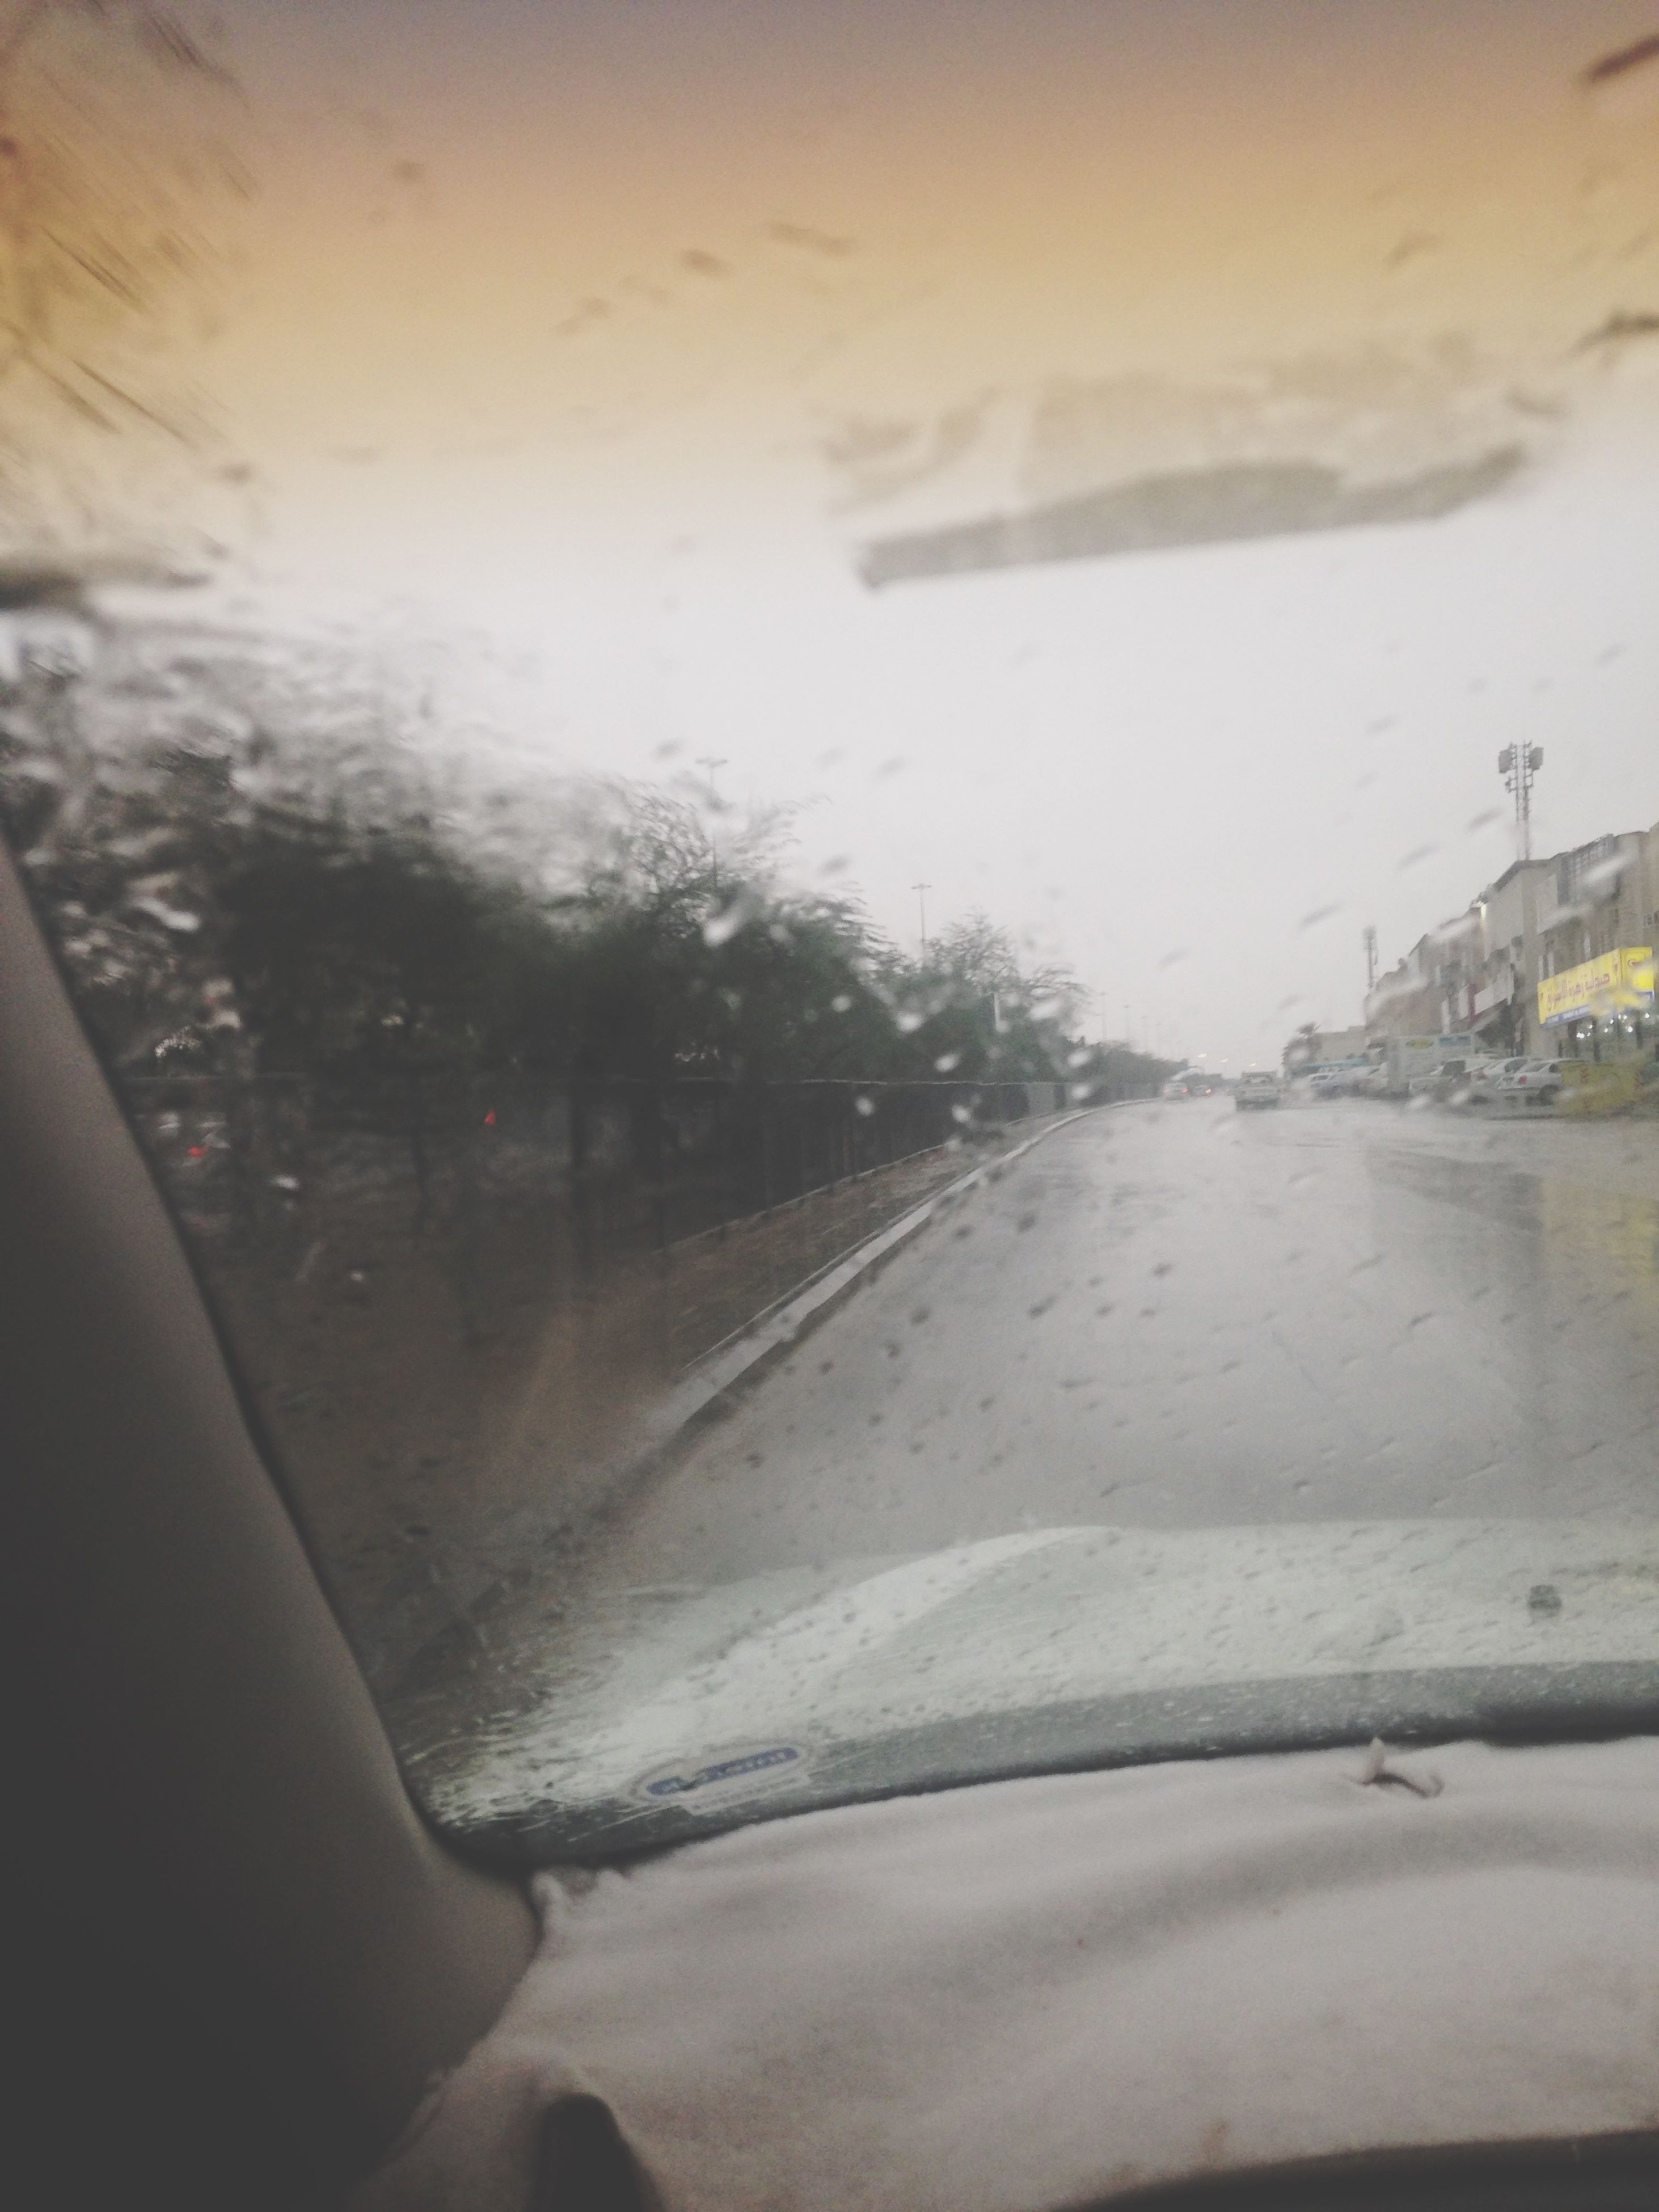 transportation, glass - material, vehicle interior, mode of transport, transparent, window, car, land vehicle, windshield, wet, car interior, rain, part of, drop, season, weather, water, travel